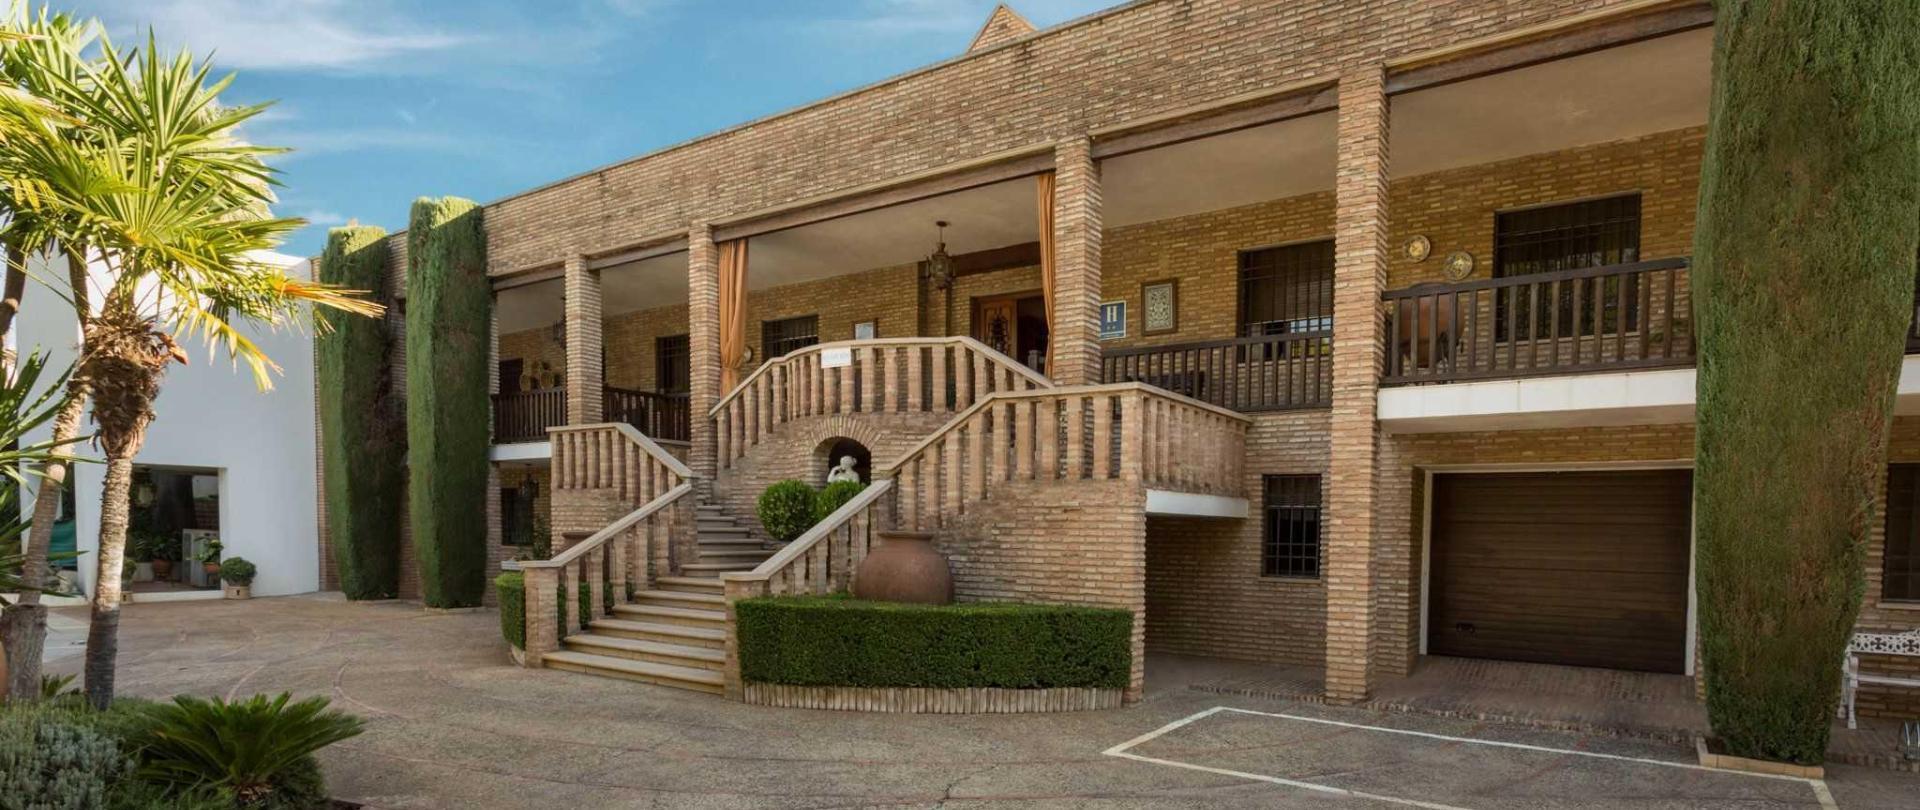 fachada-principal-3.JPG